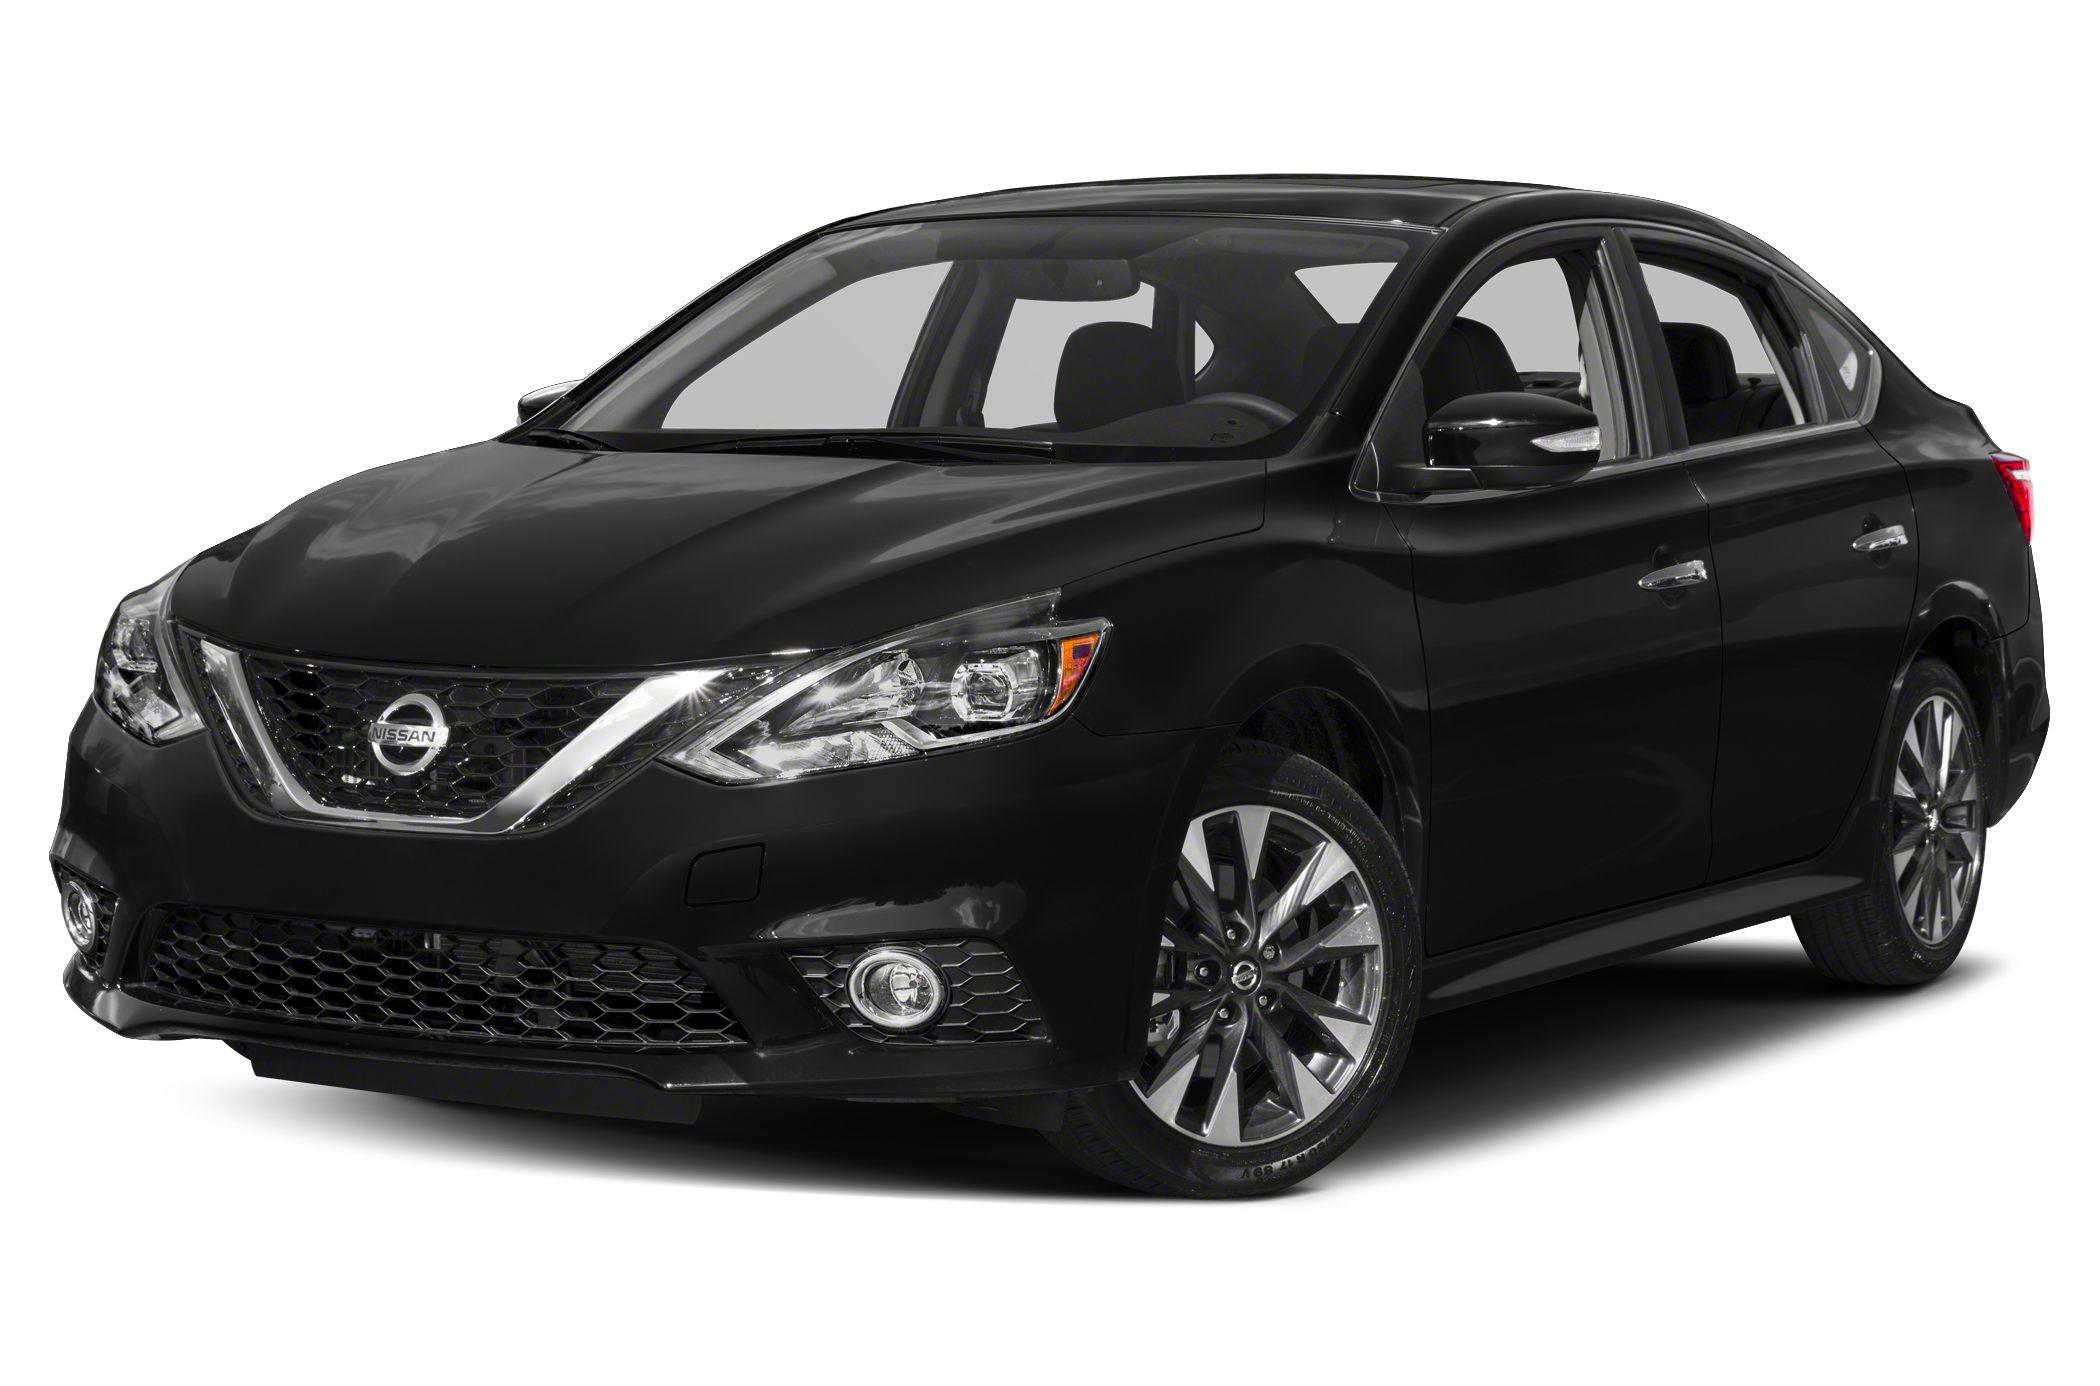 Toyota  Lexus expanding Takata airbag recall  renotifying customers